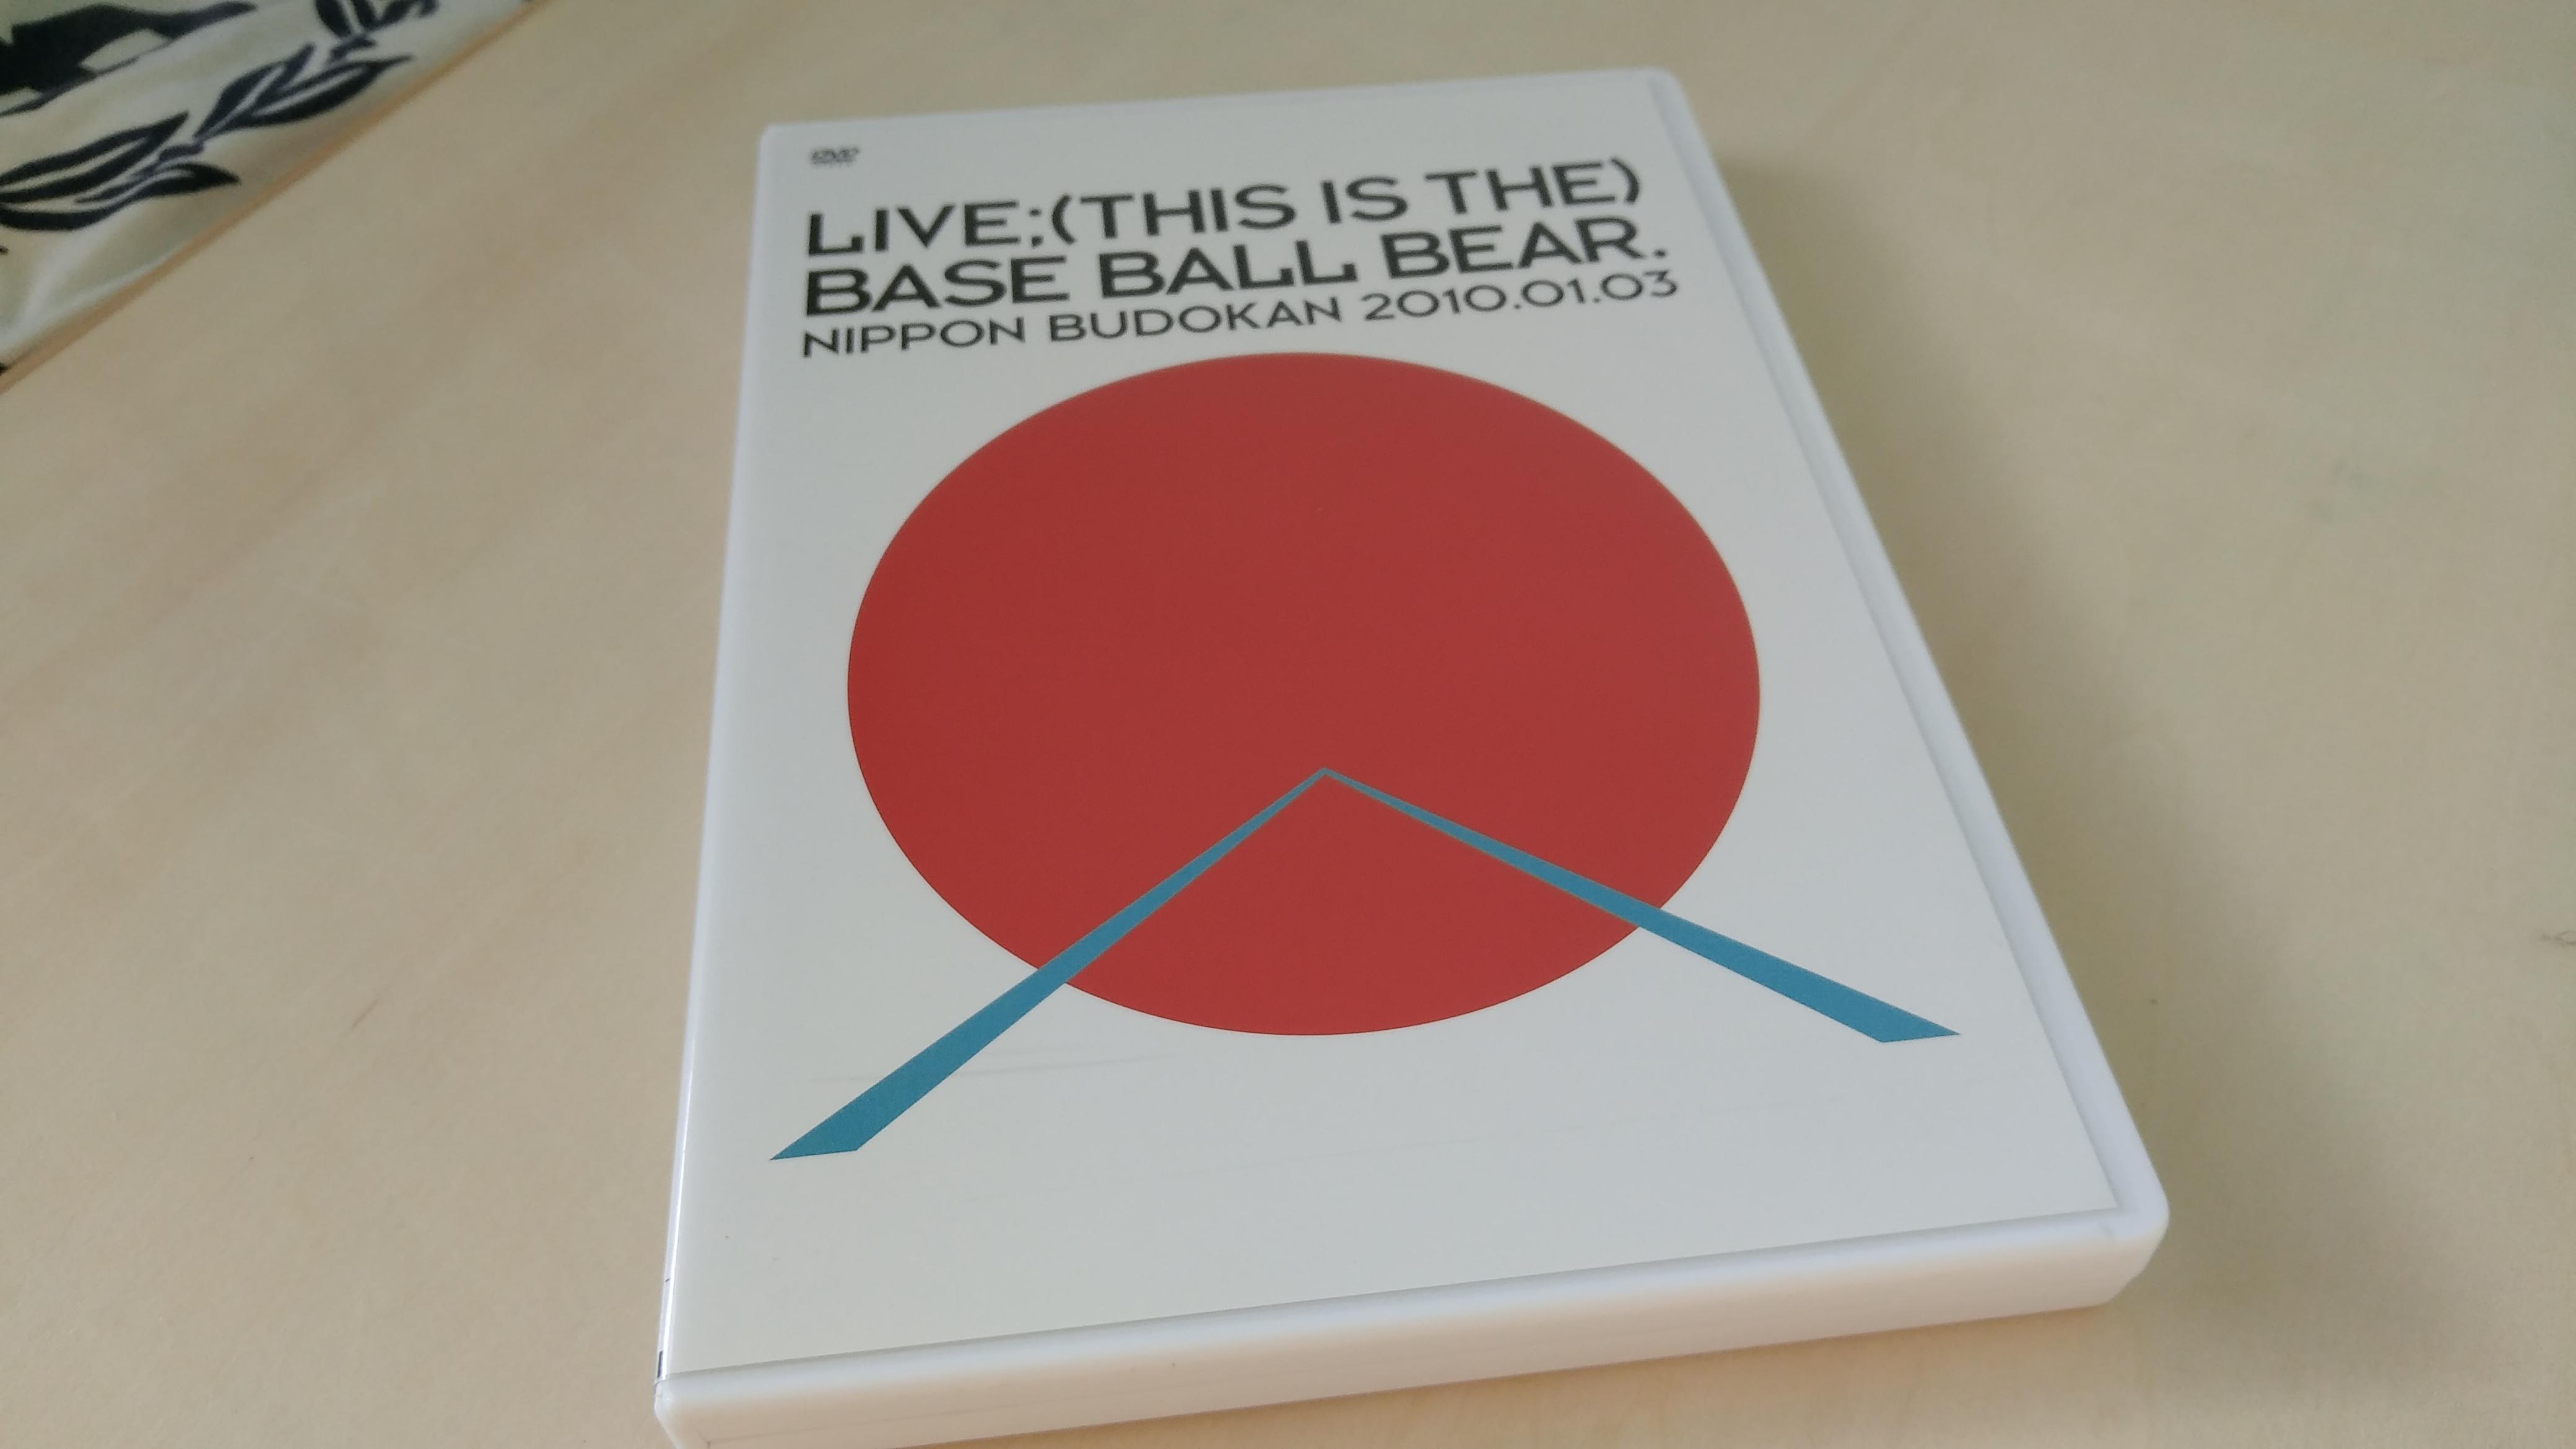 Base Ball Bear Live With AT-MSR7!... (ฅ>ω<ฅ) ✨